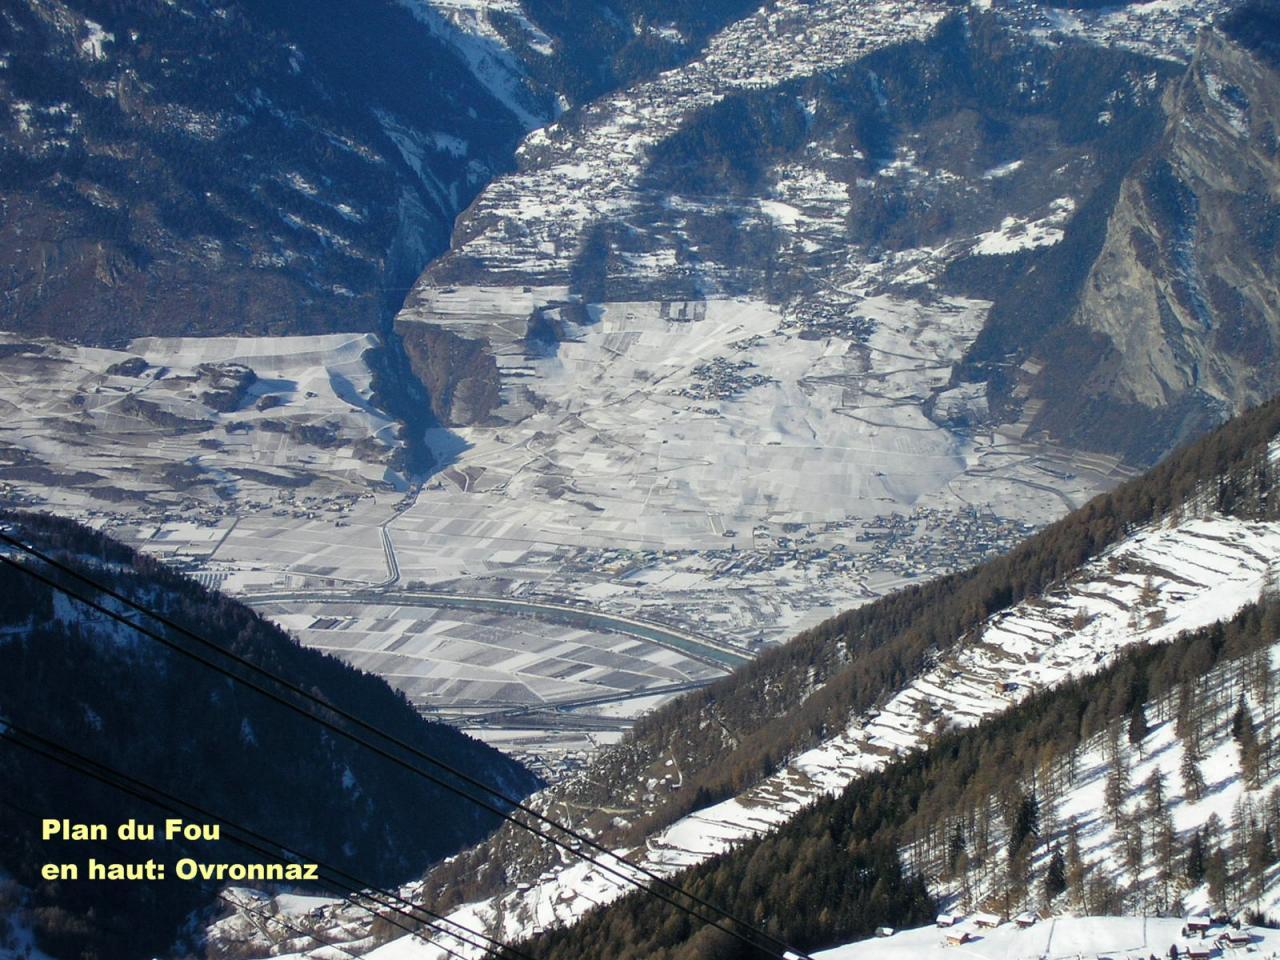 Ovronnaz und Rhonetal :  v. Plan du Fou